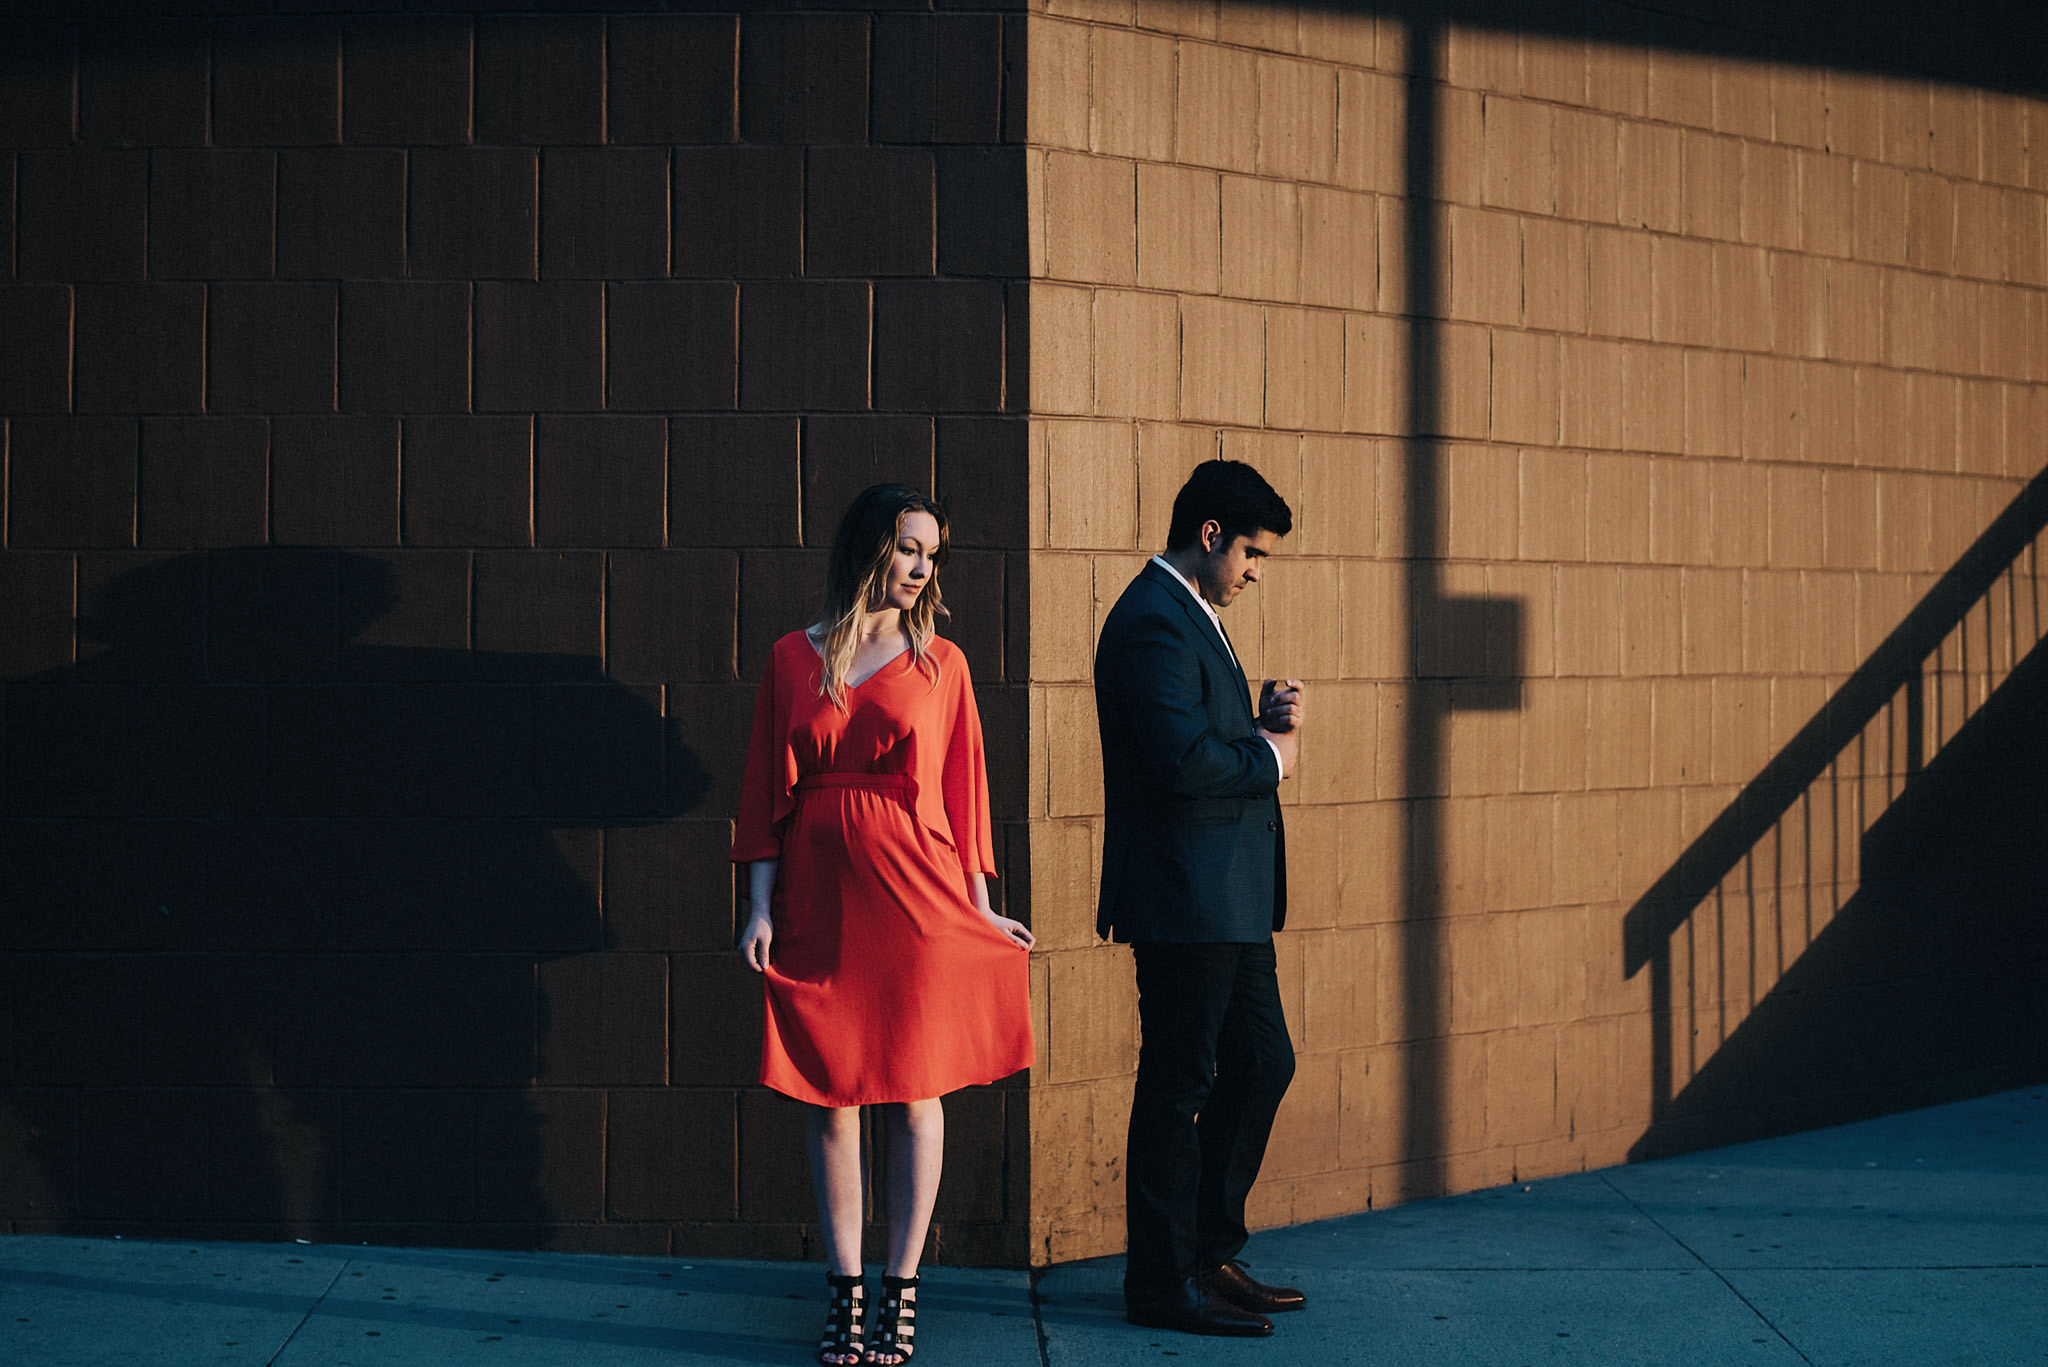 New-York-Photographer-Engagement-Felipe-Carranza-31